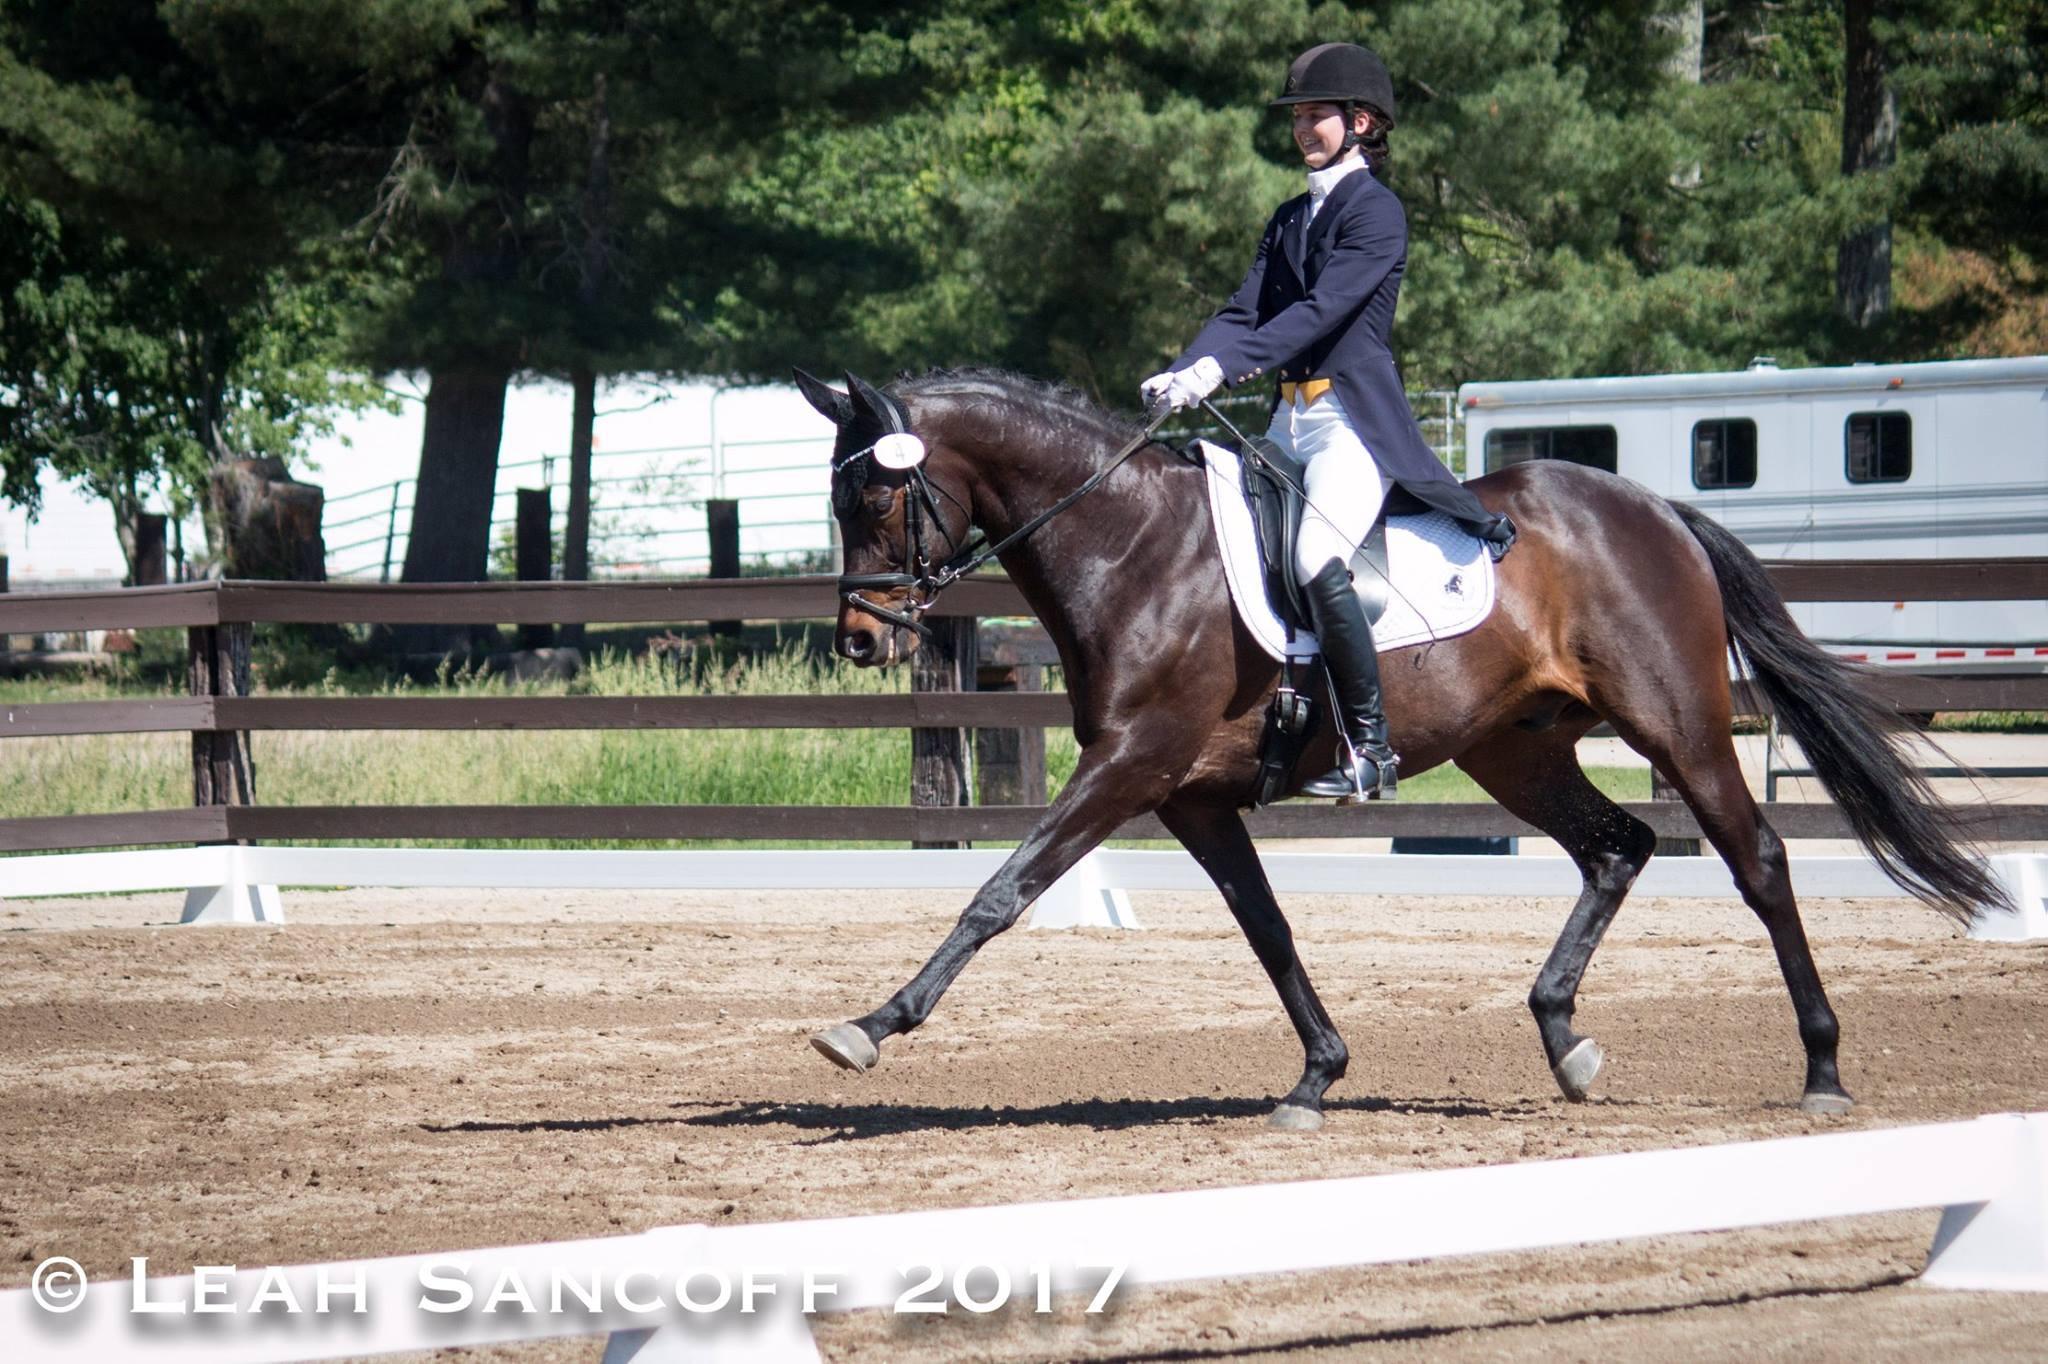 Horse trainer Chesapeake